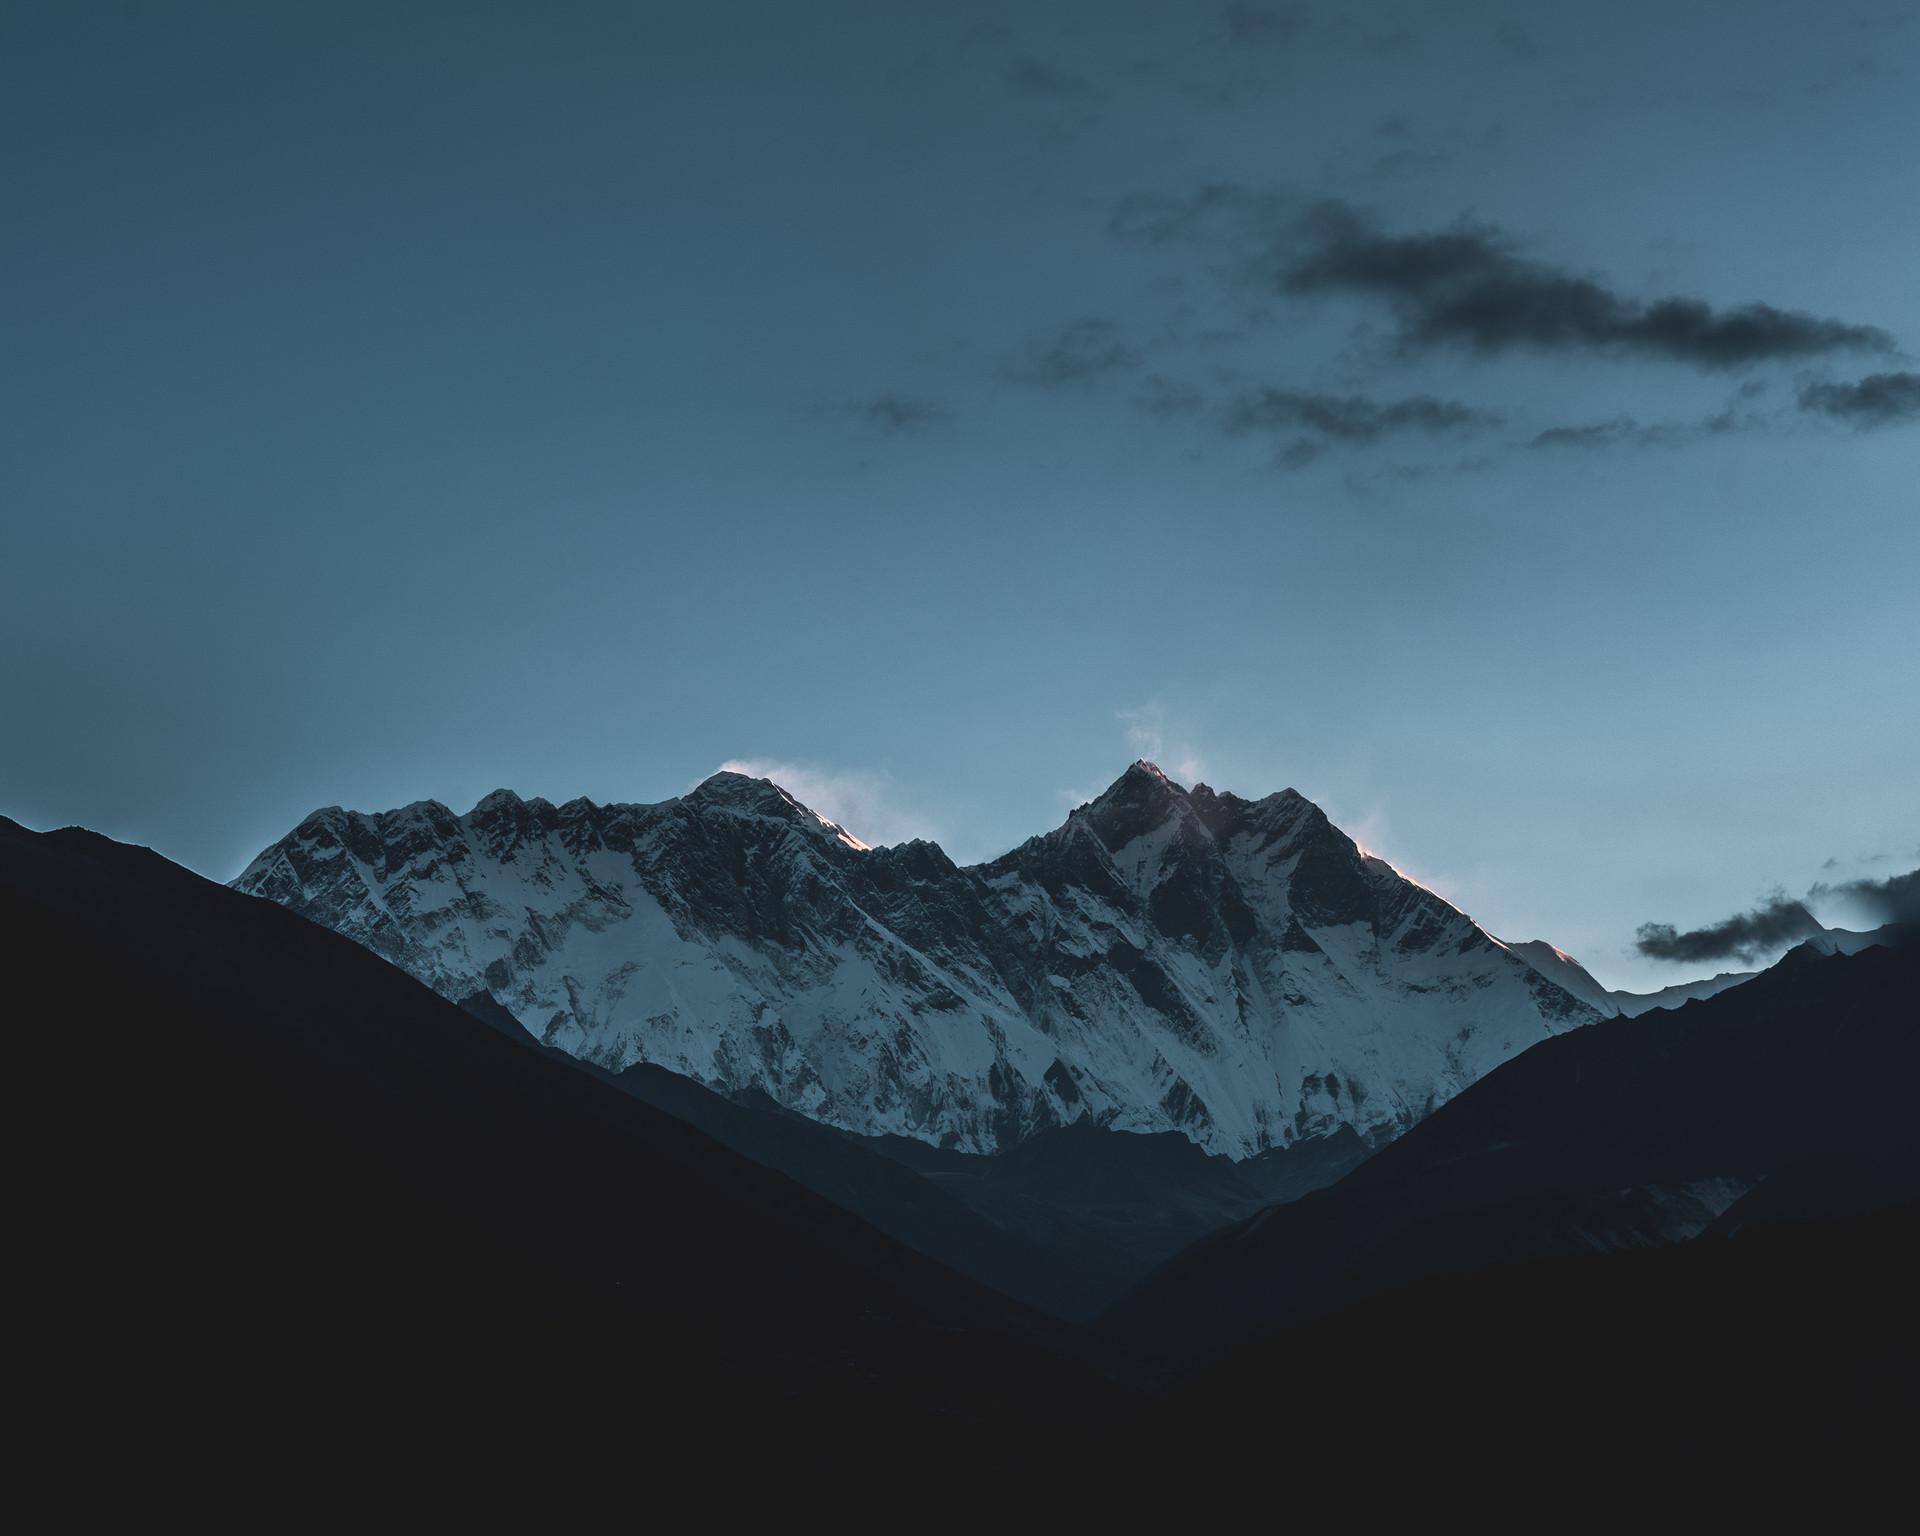 nepal_port-140186.jpg